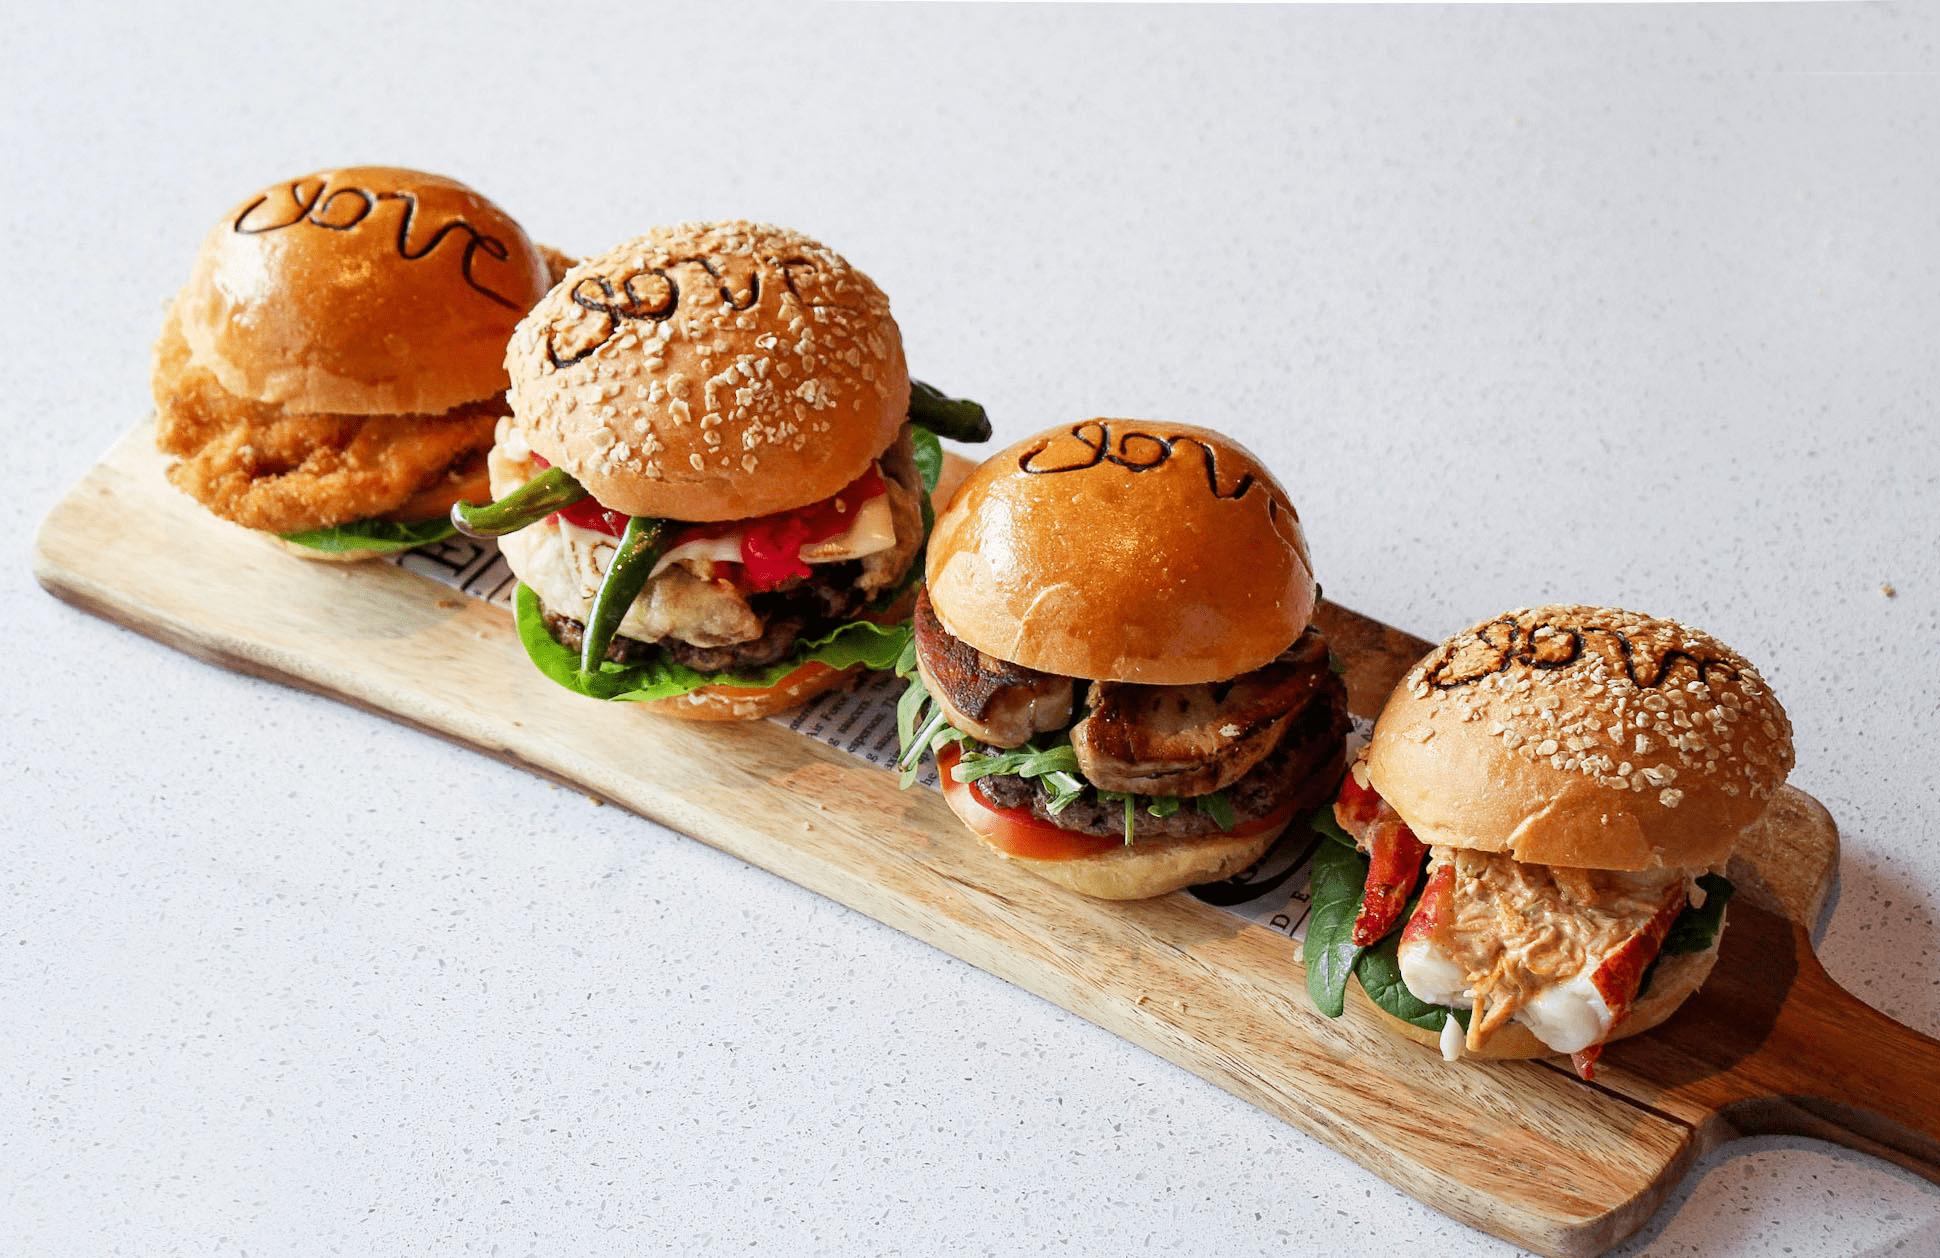 CLOVE Burgers - Swissotel The Stamford Singapore